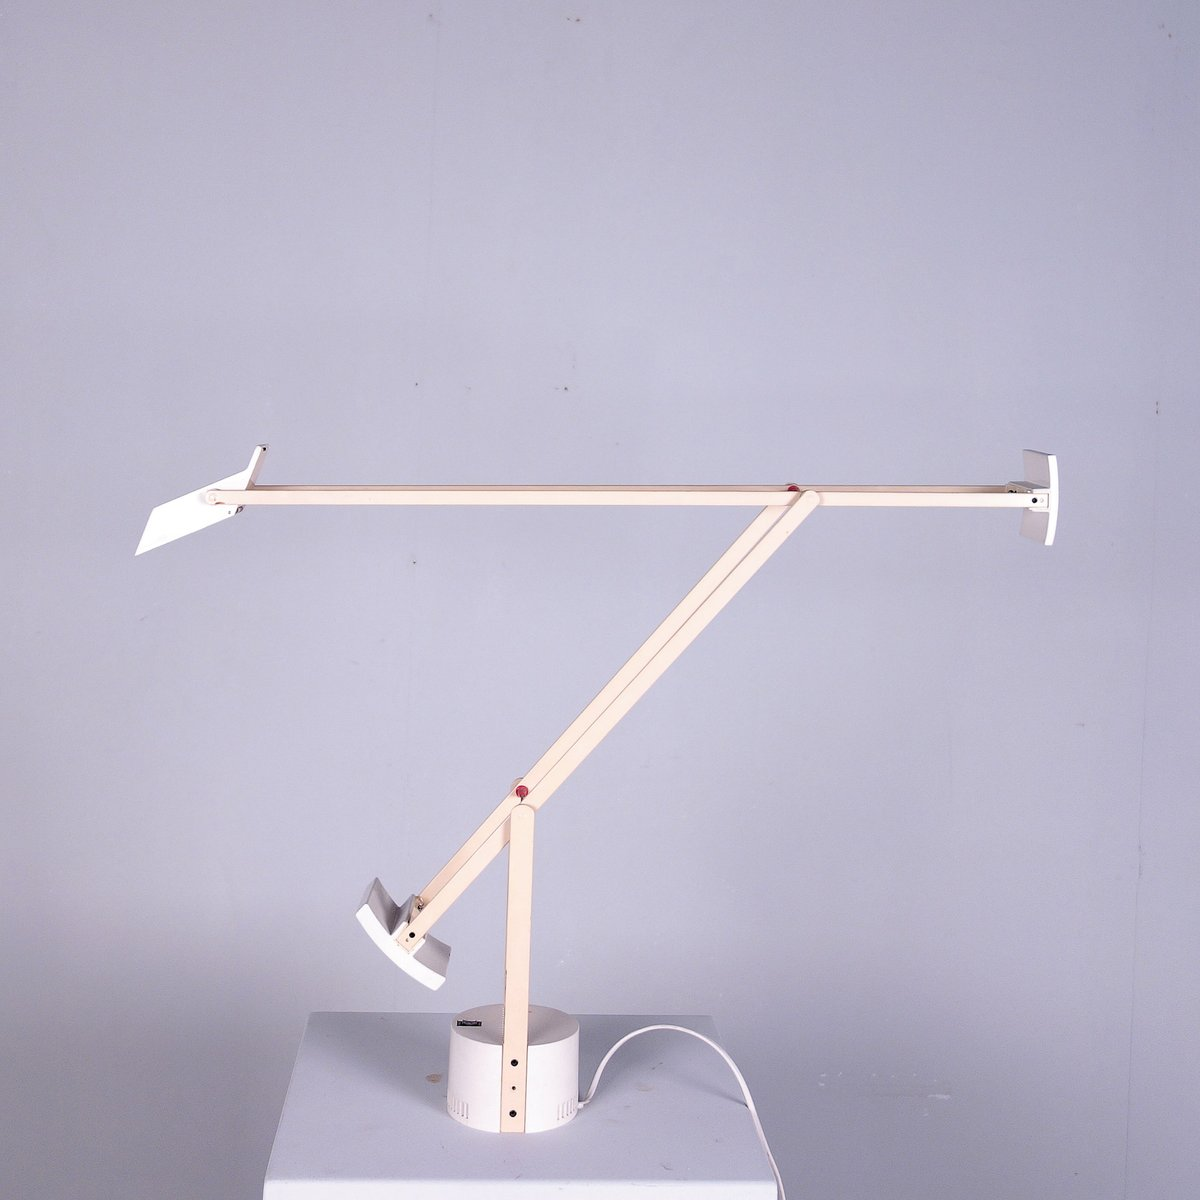 Vintage tizio desk lamp by richard sapper for artemide for sale at pamono - Gloeilamp tizio lamp ...